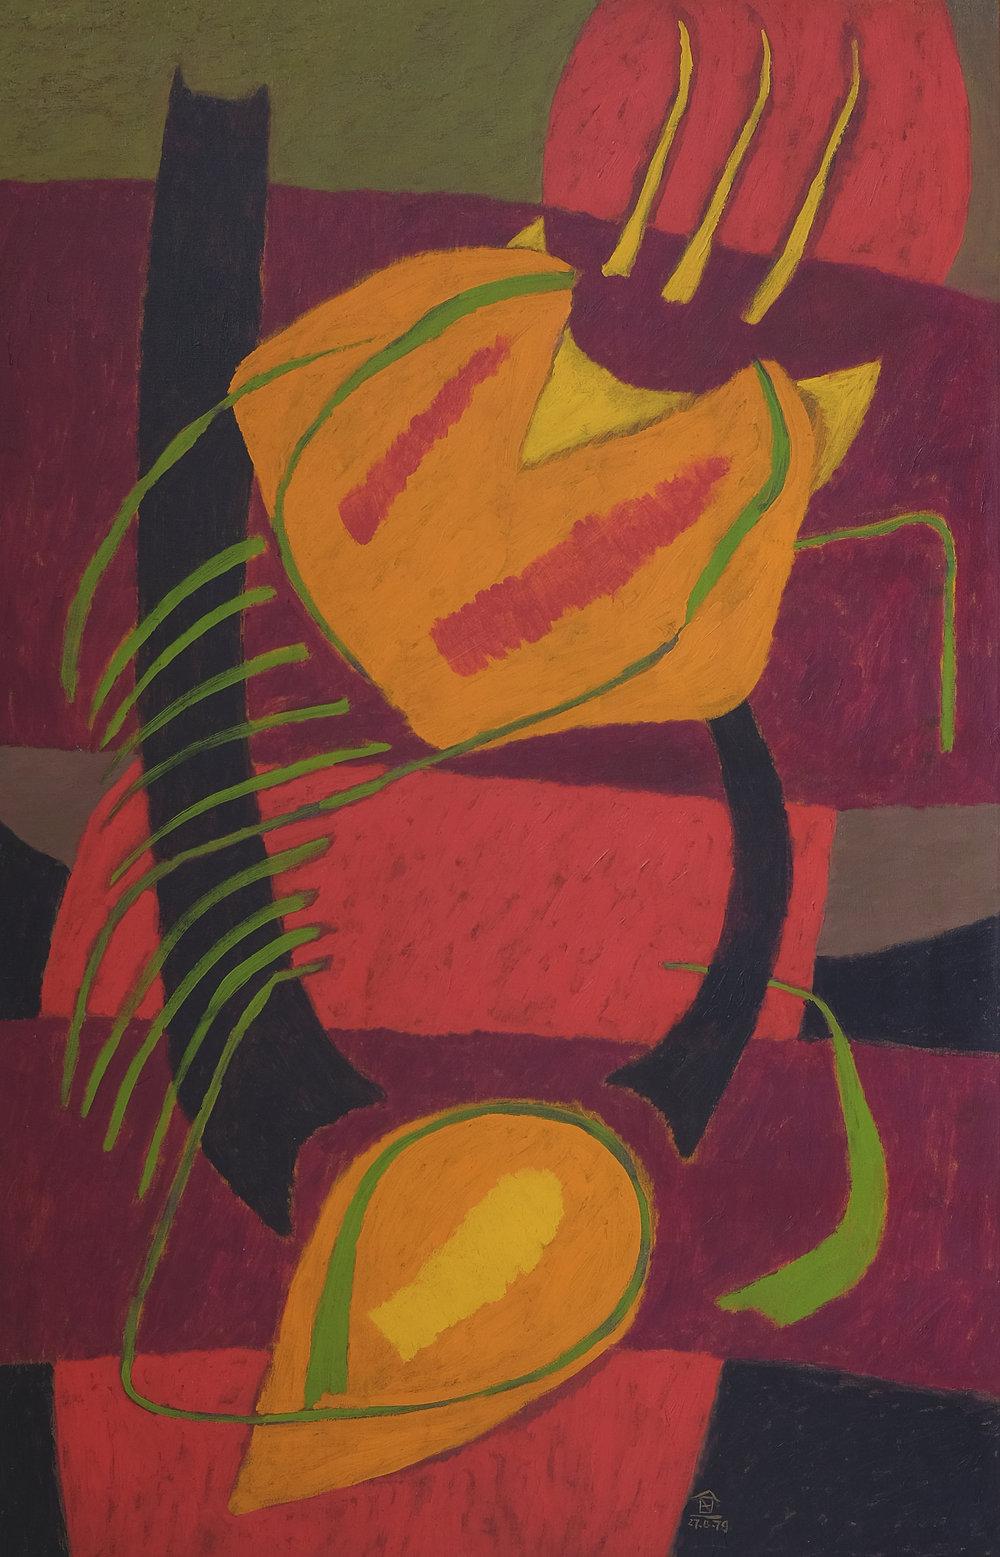 Nashar, Bertumbuh (Growth), oil on canvas, 137 x 88 cm, 1979